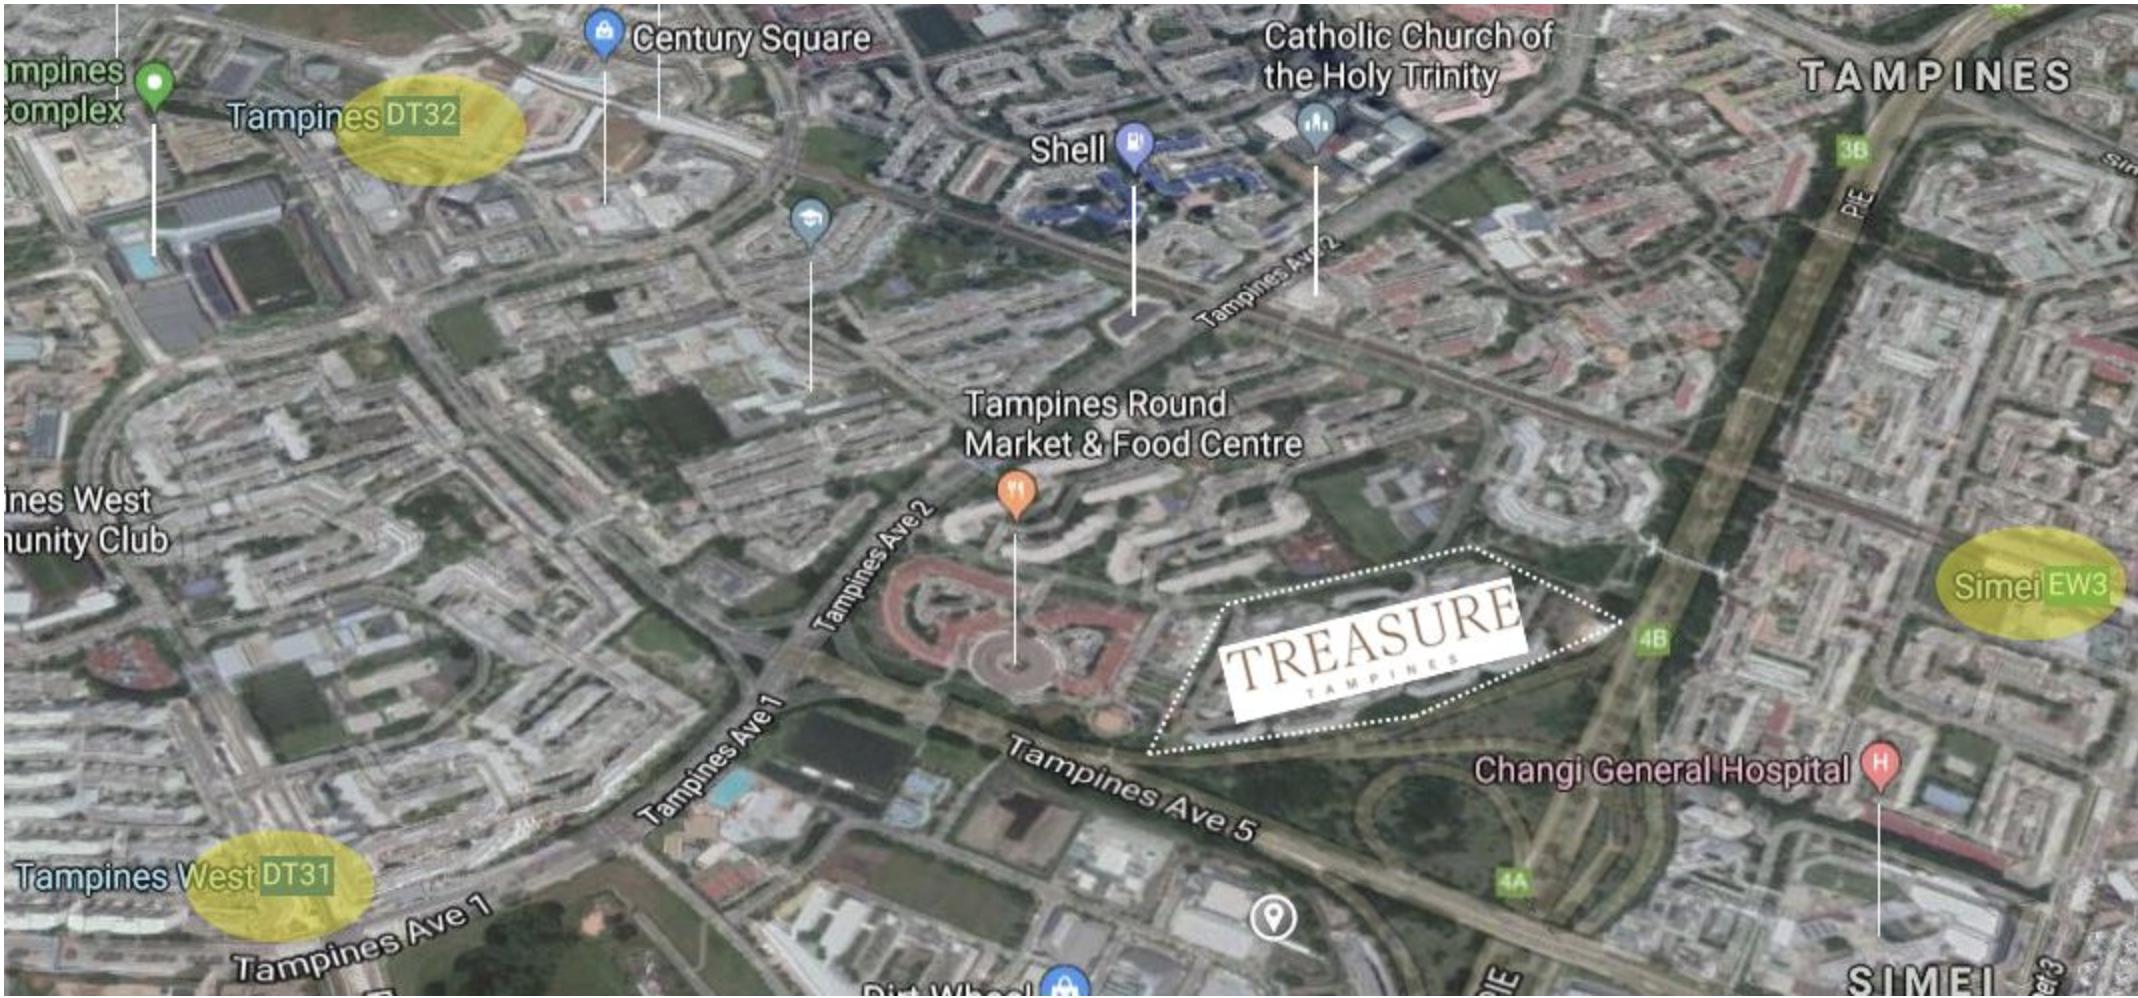 Treasure at Tampines surrounding amenities like MRT stations, malles, hospitals.